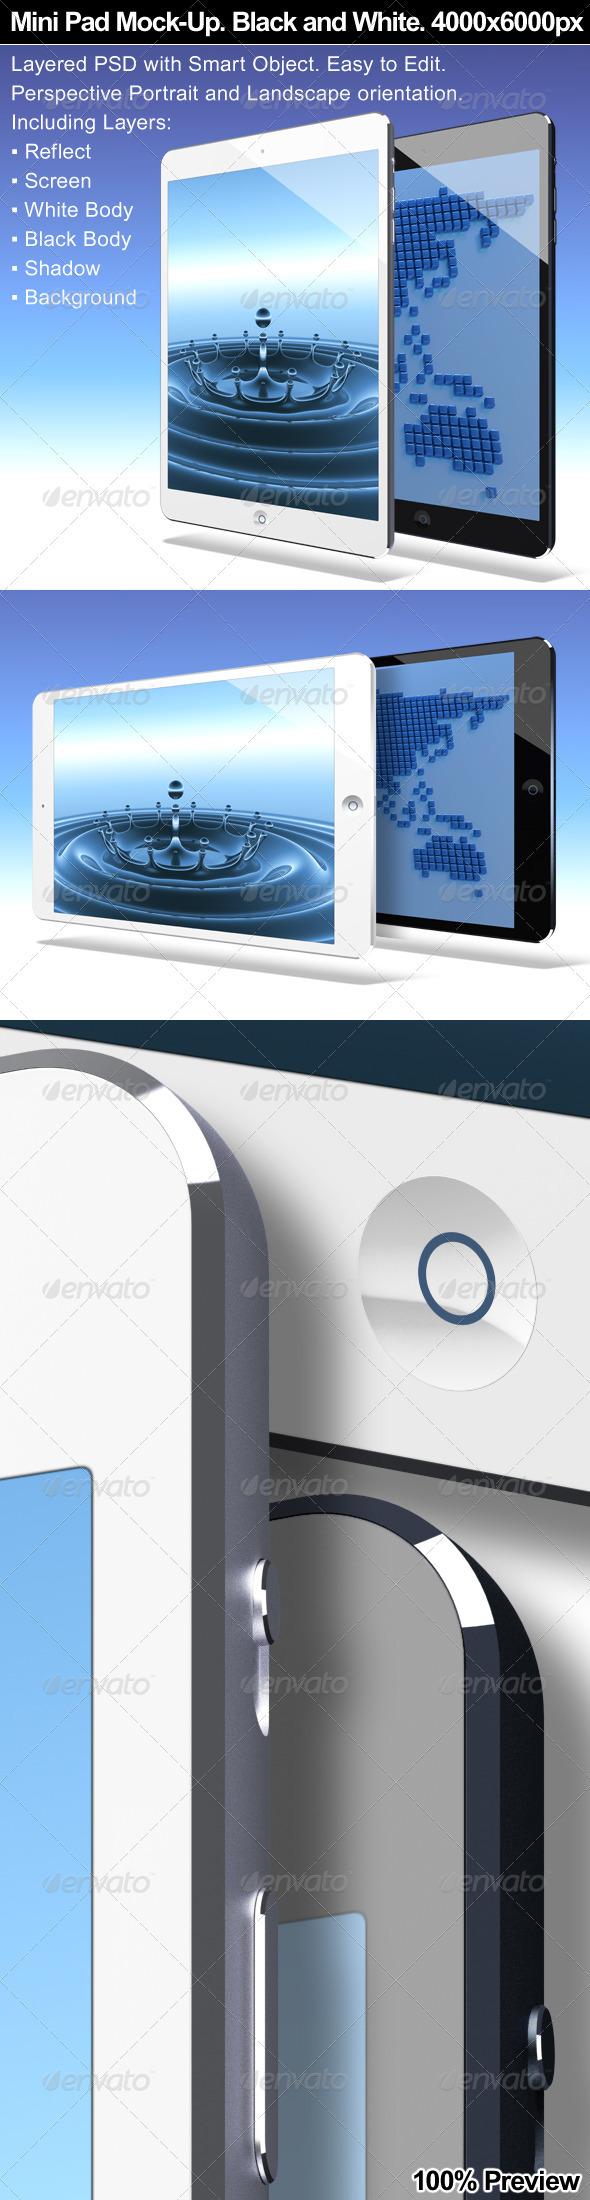 Mini Pad Tablet Mock-Up - Mobile Displays